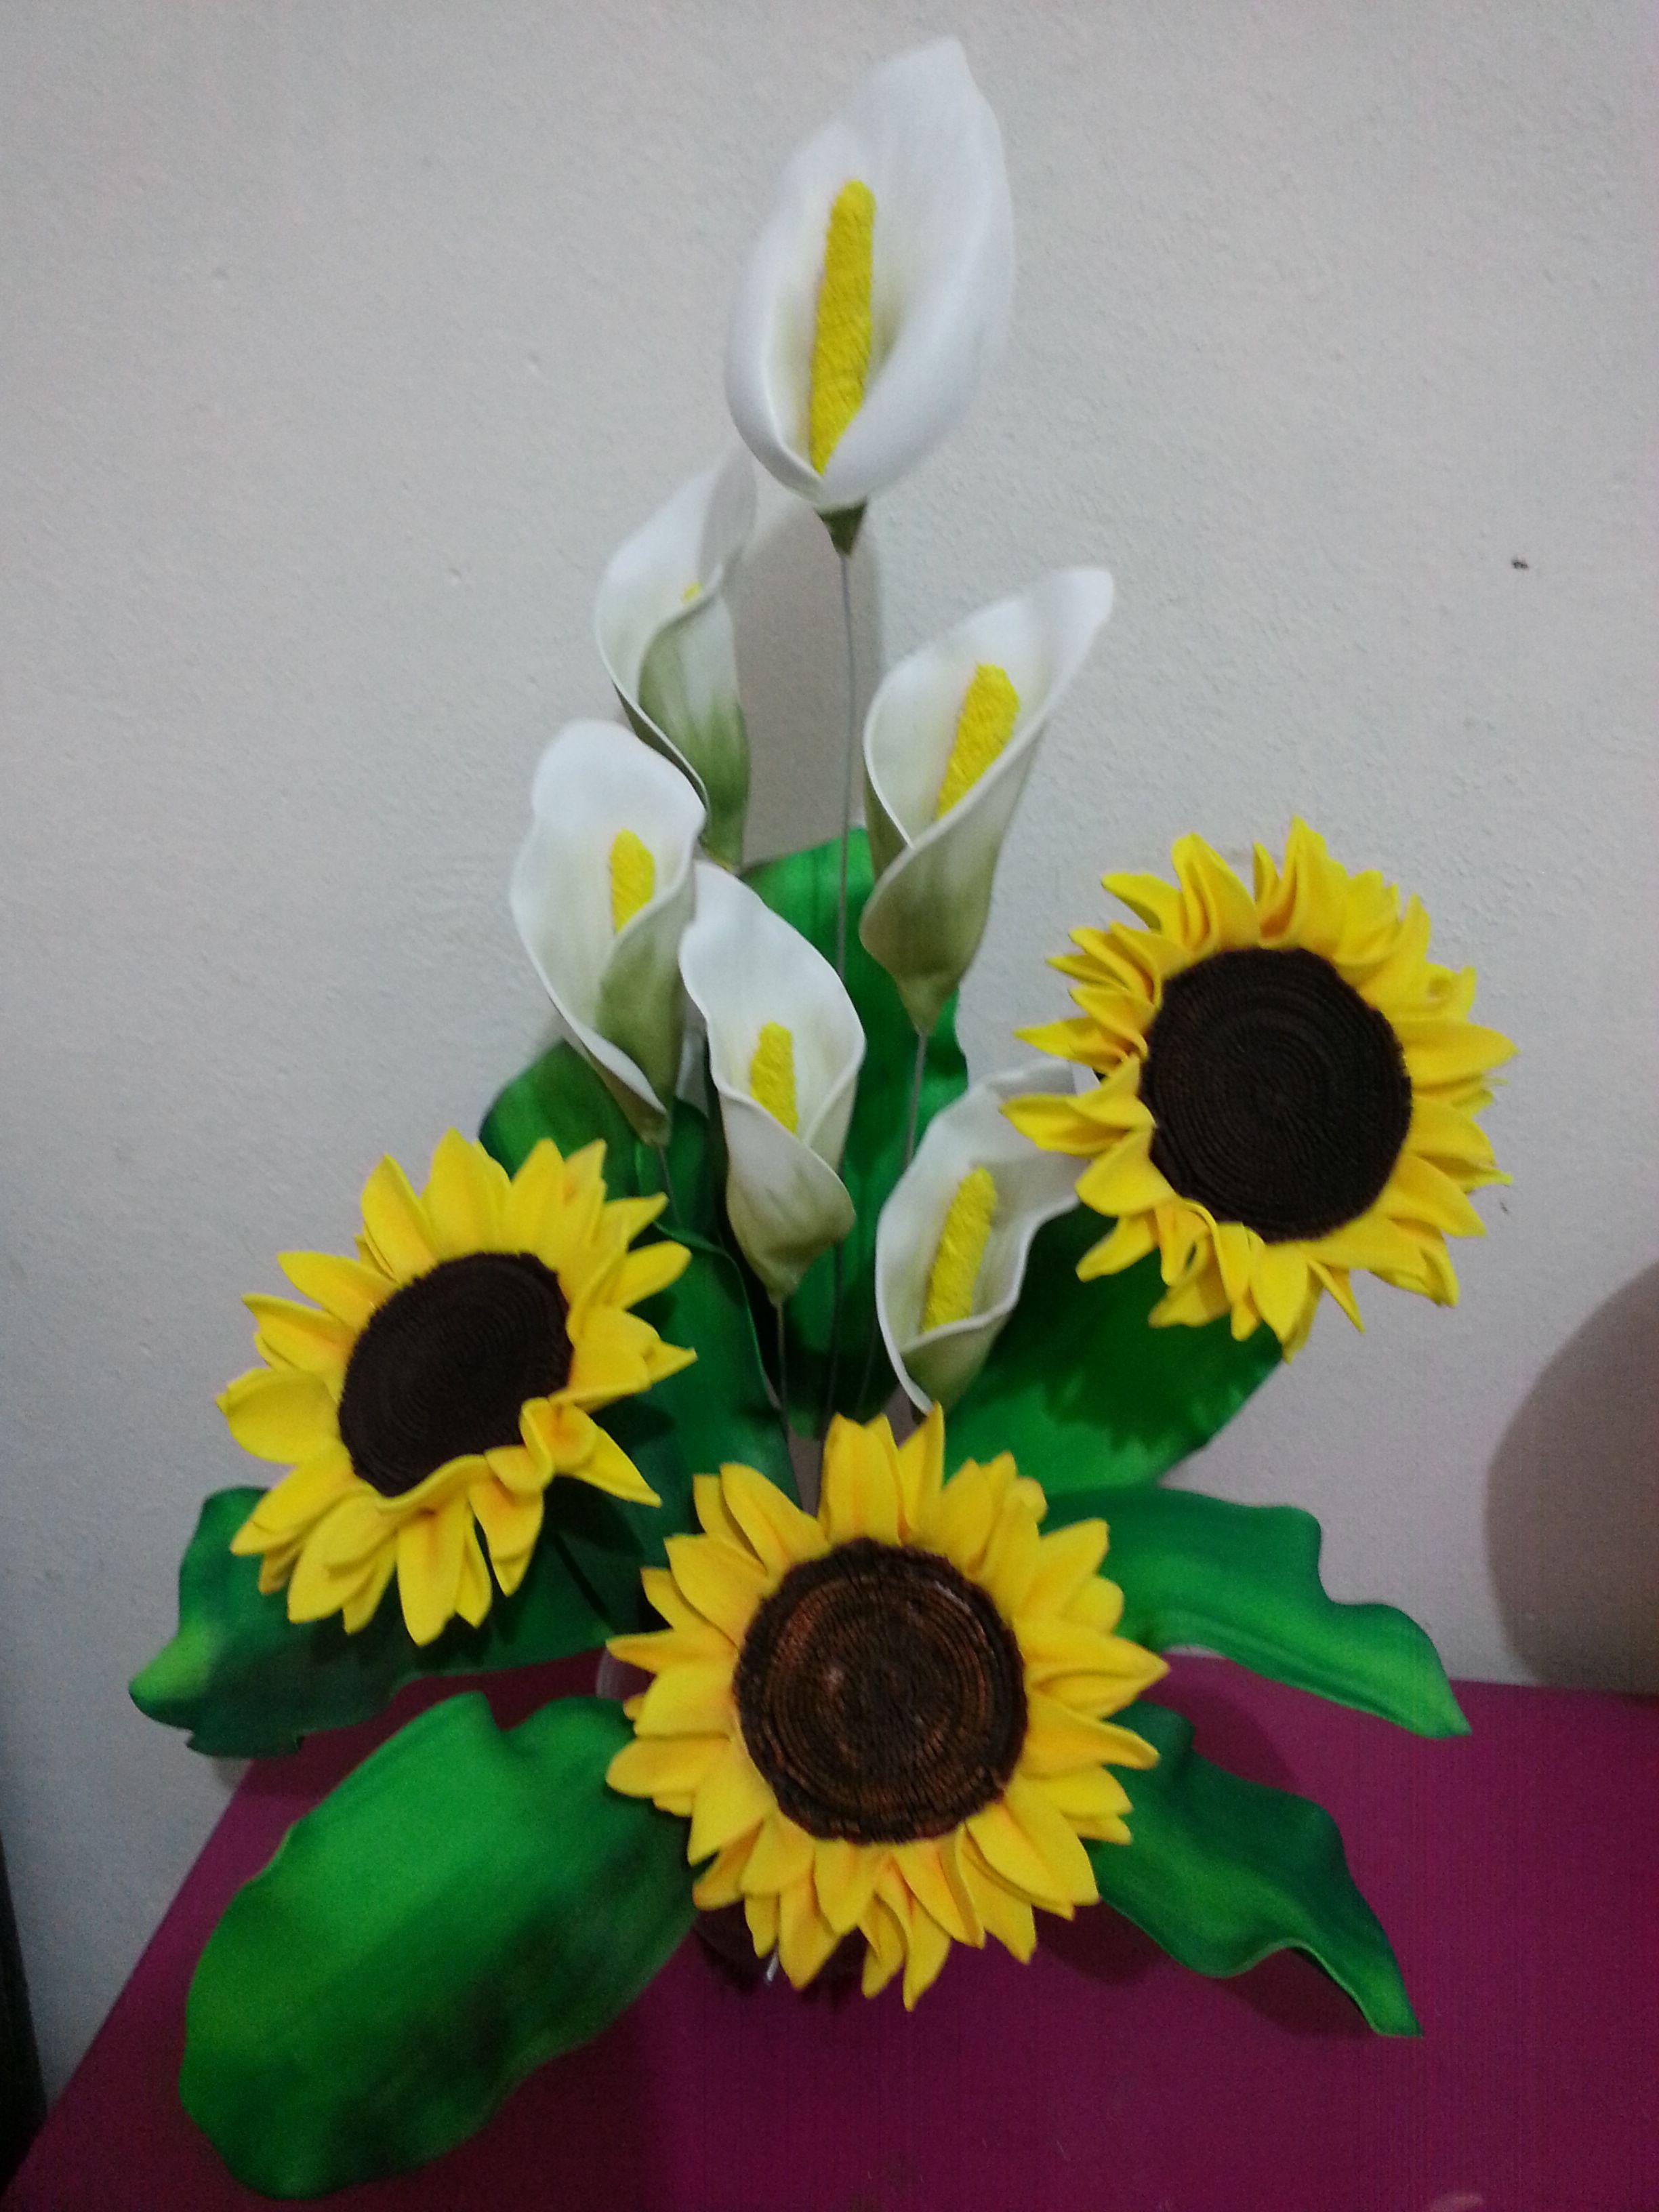 girasoles de goma eva   Flores de fomy, Tutorial de flores de papel, Flores  de foamy